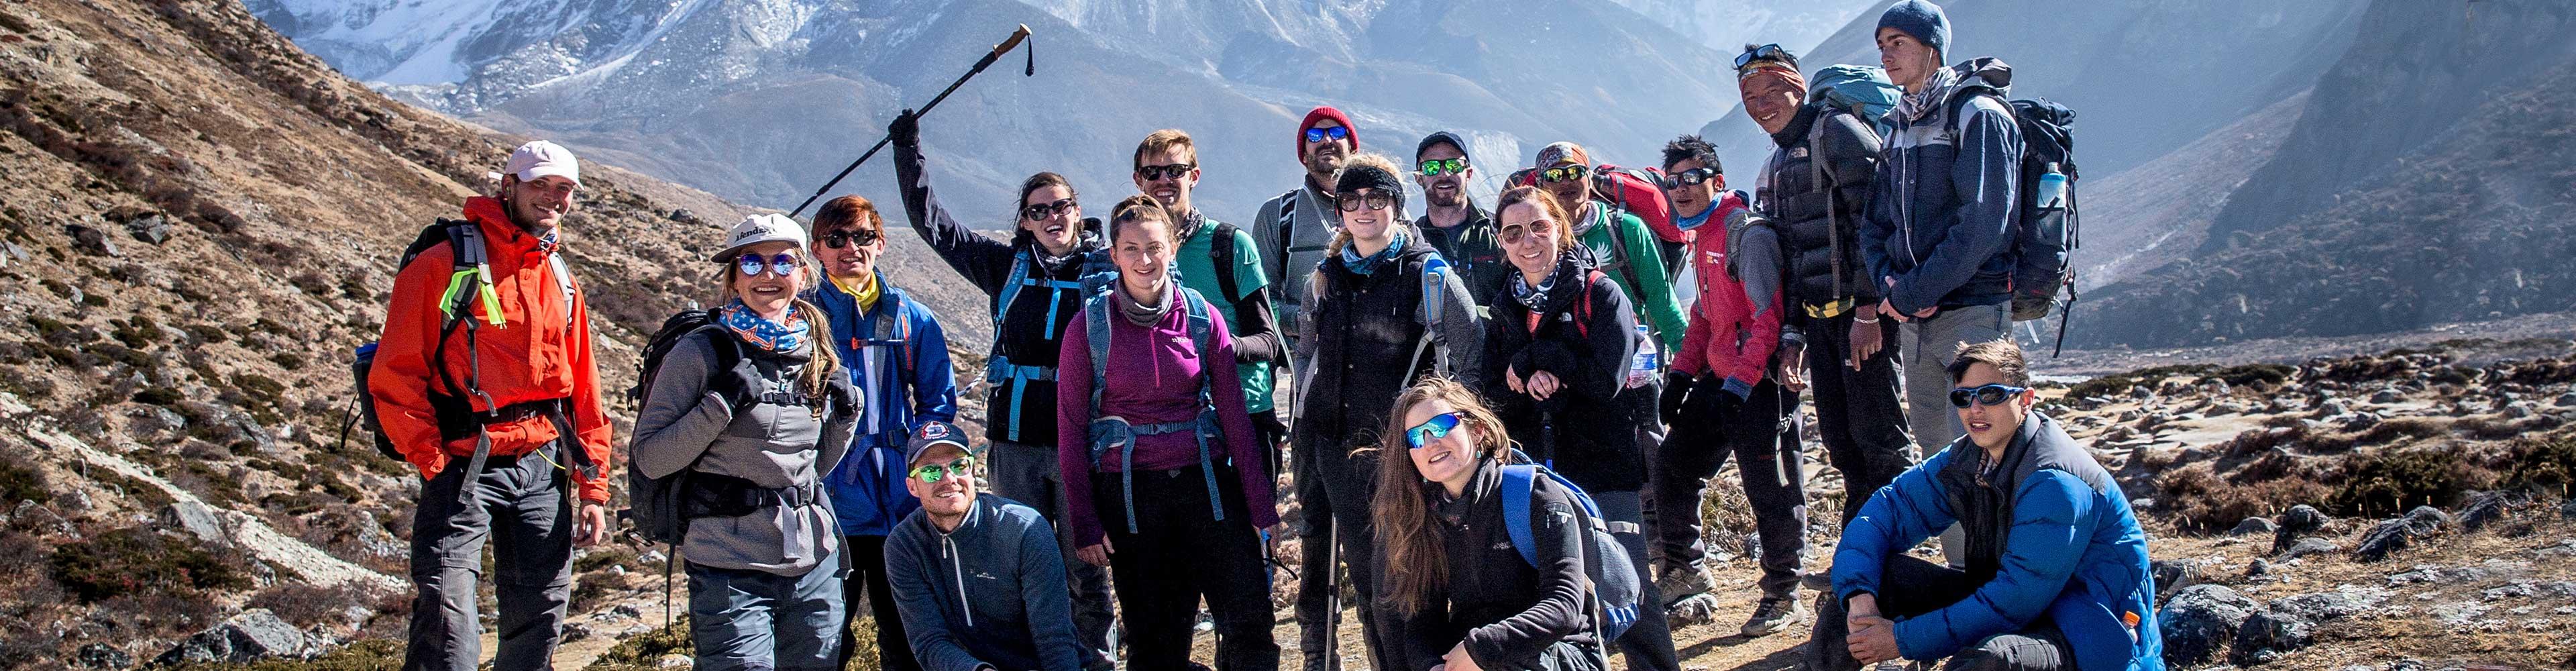 Real Everest Base Camp Trek